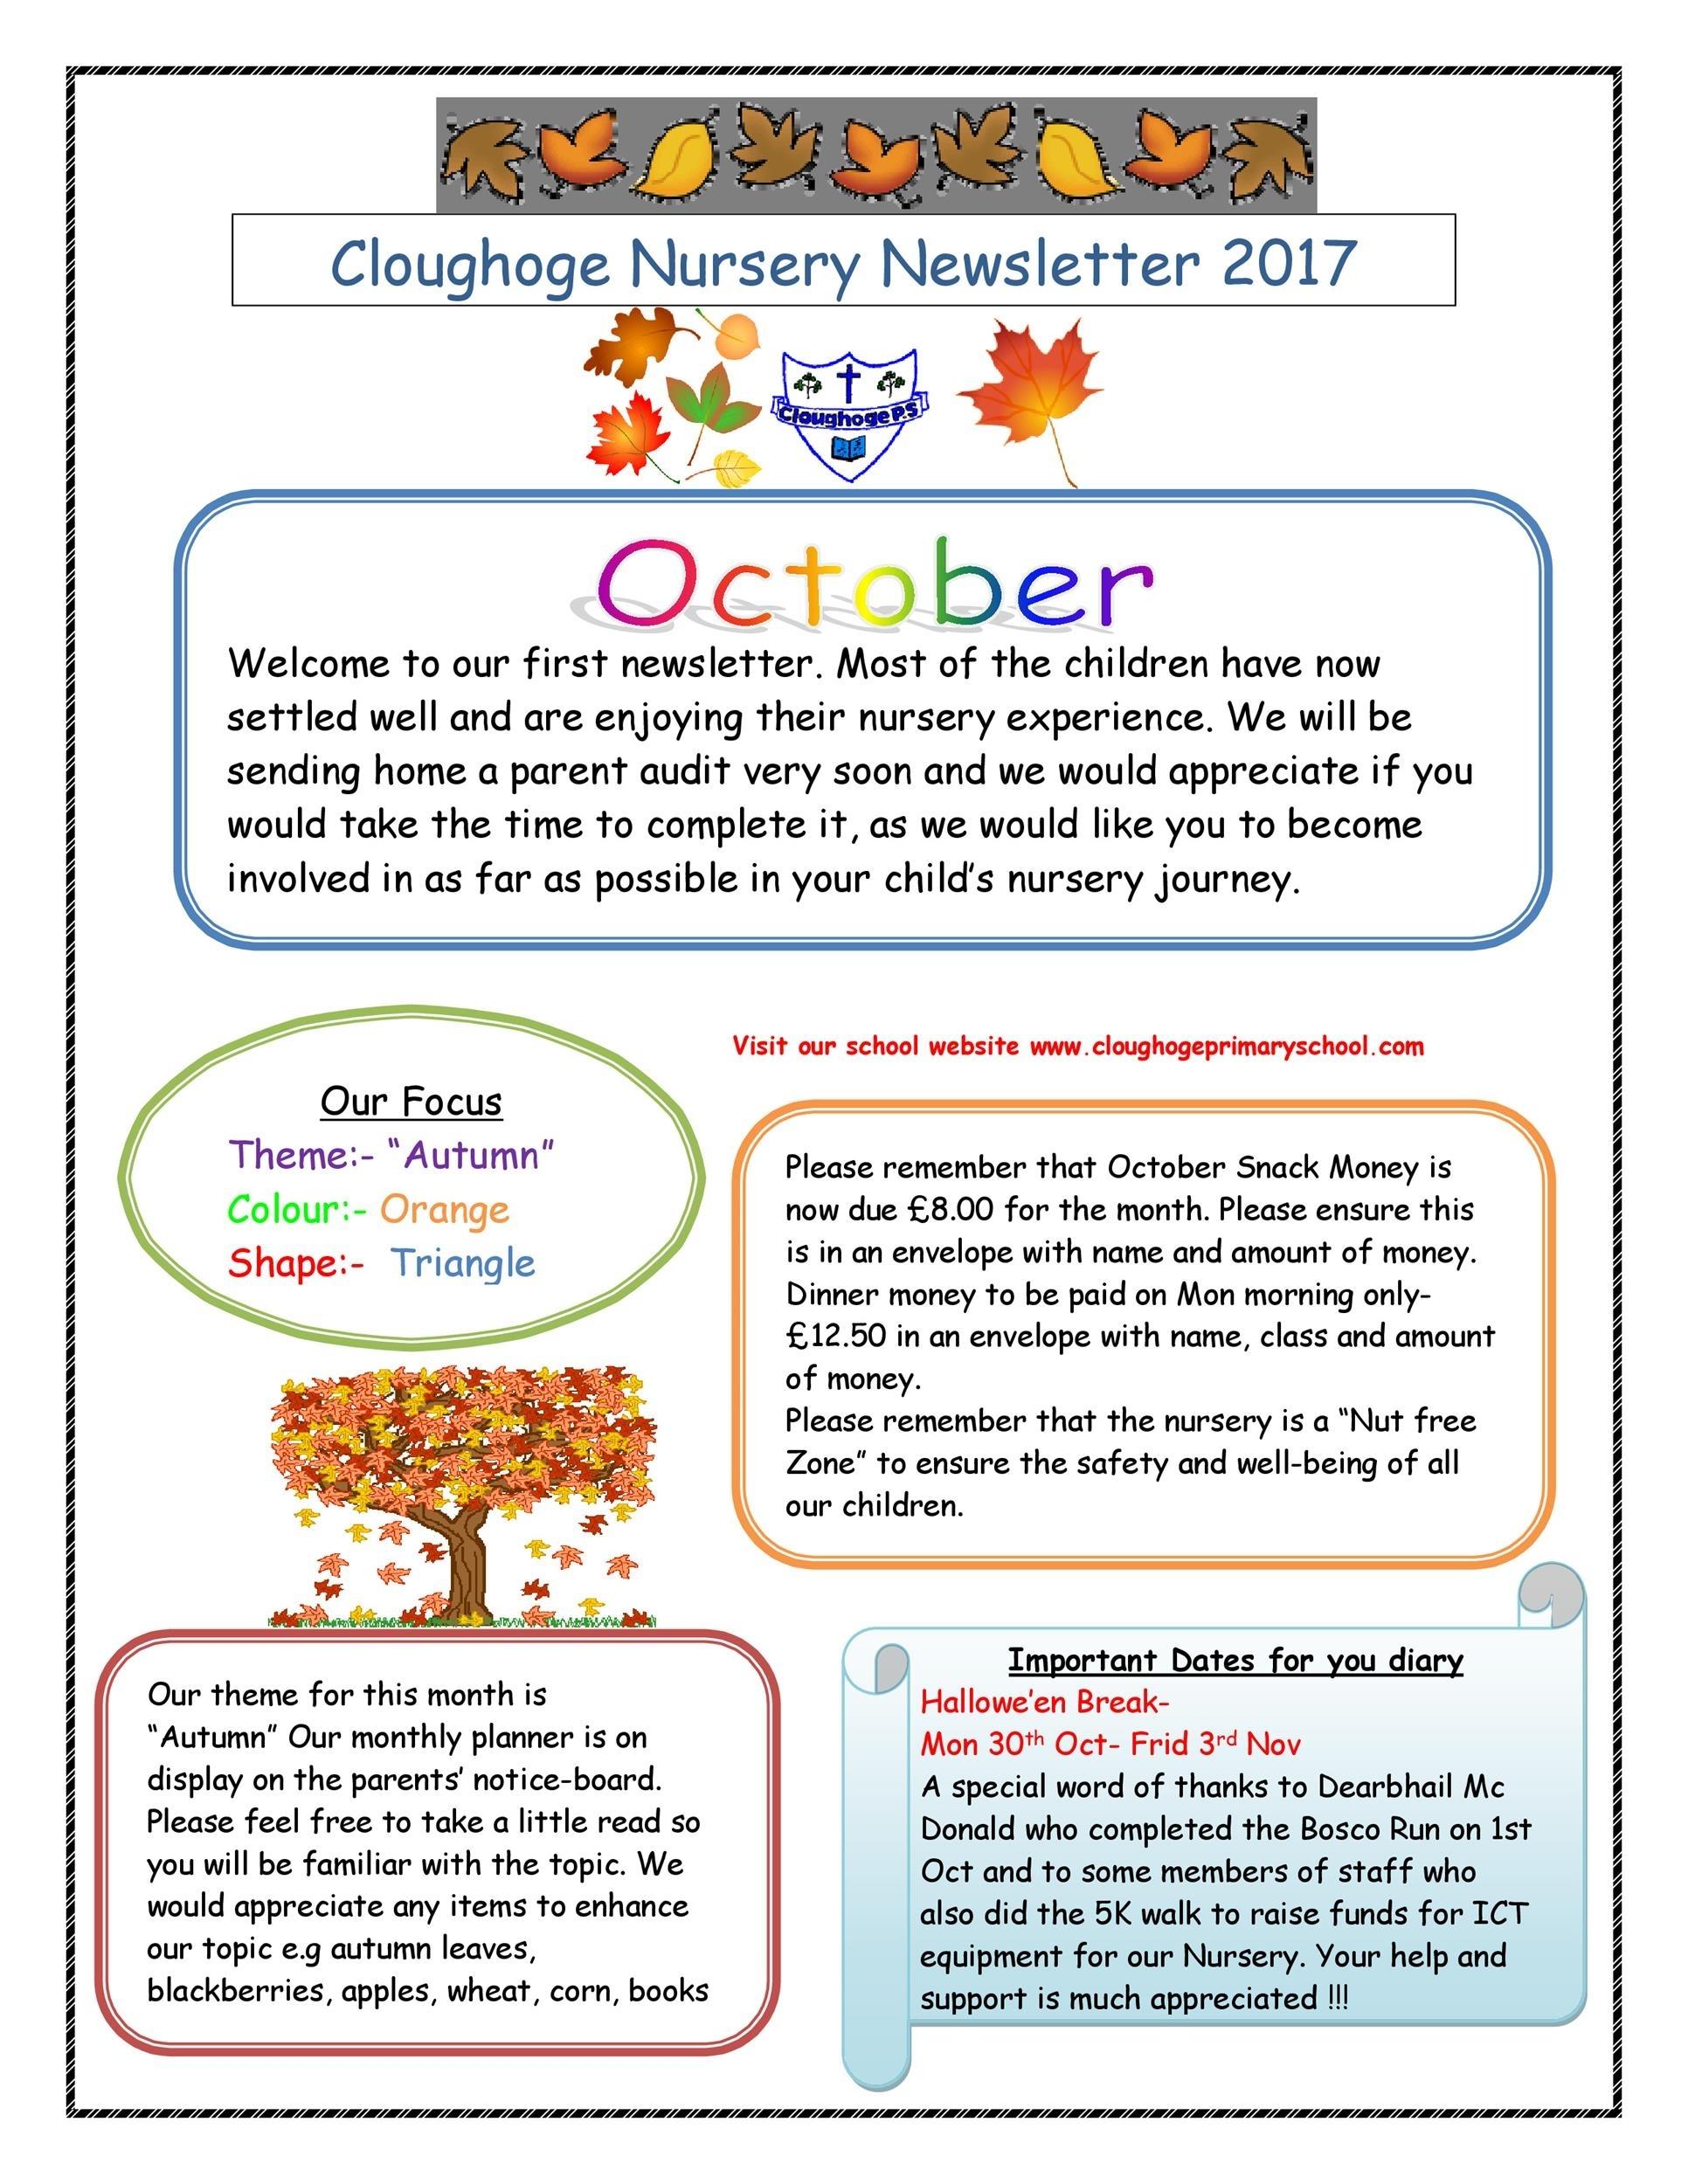 50 Creative Preschool Newsletter Templates (+Tips) ᐅ